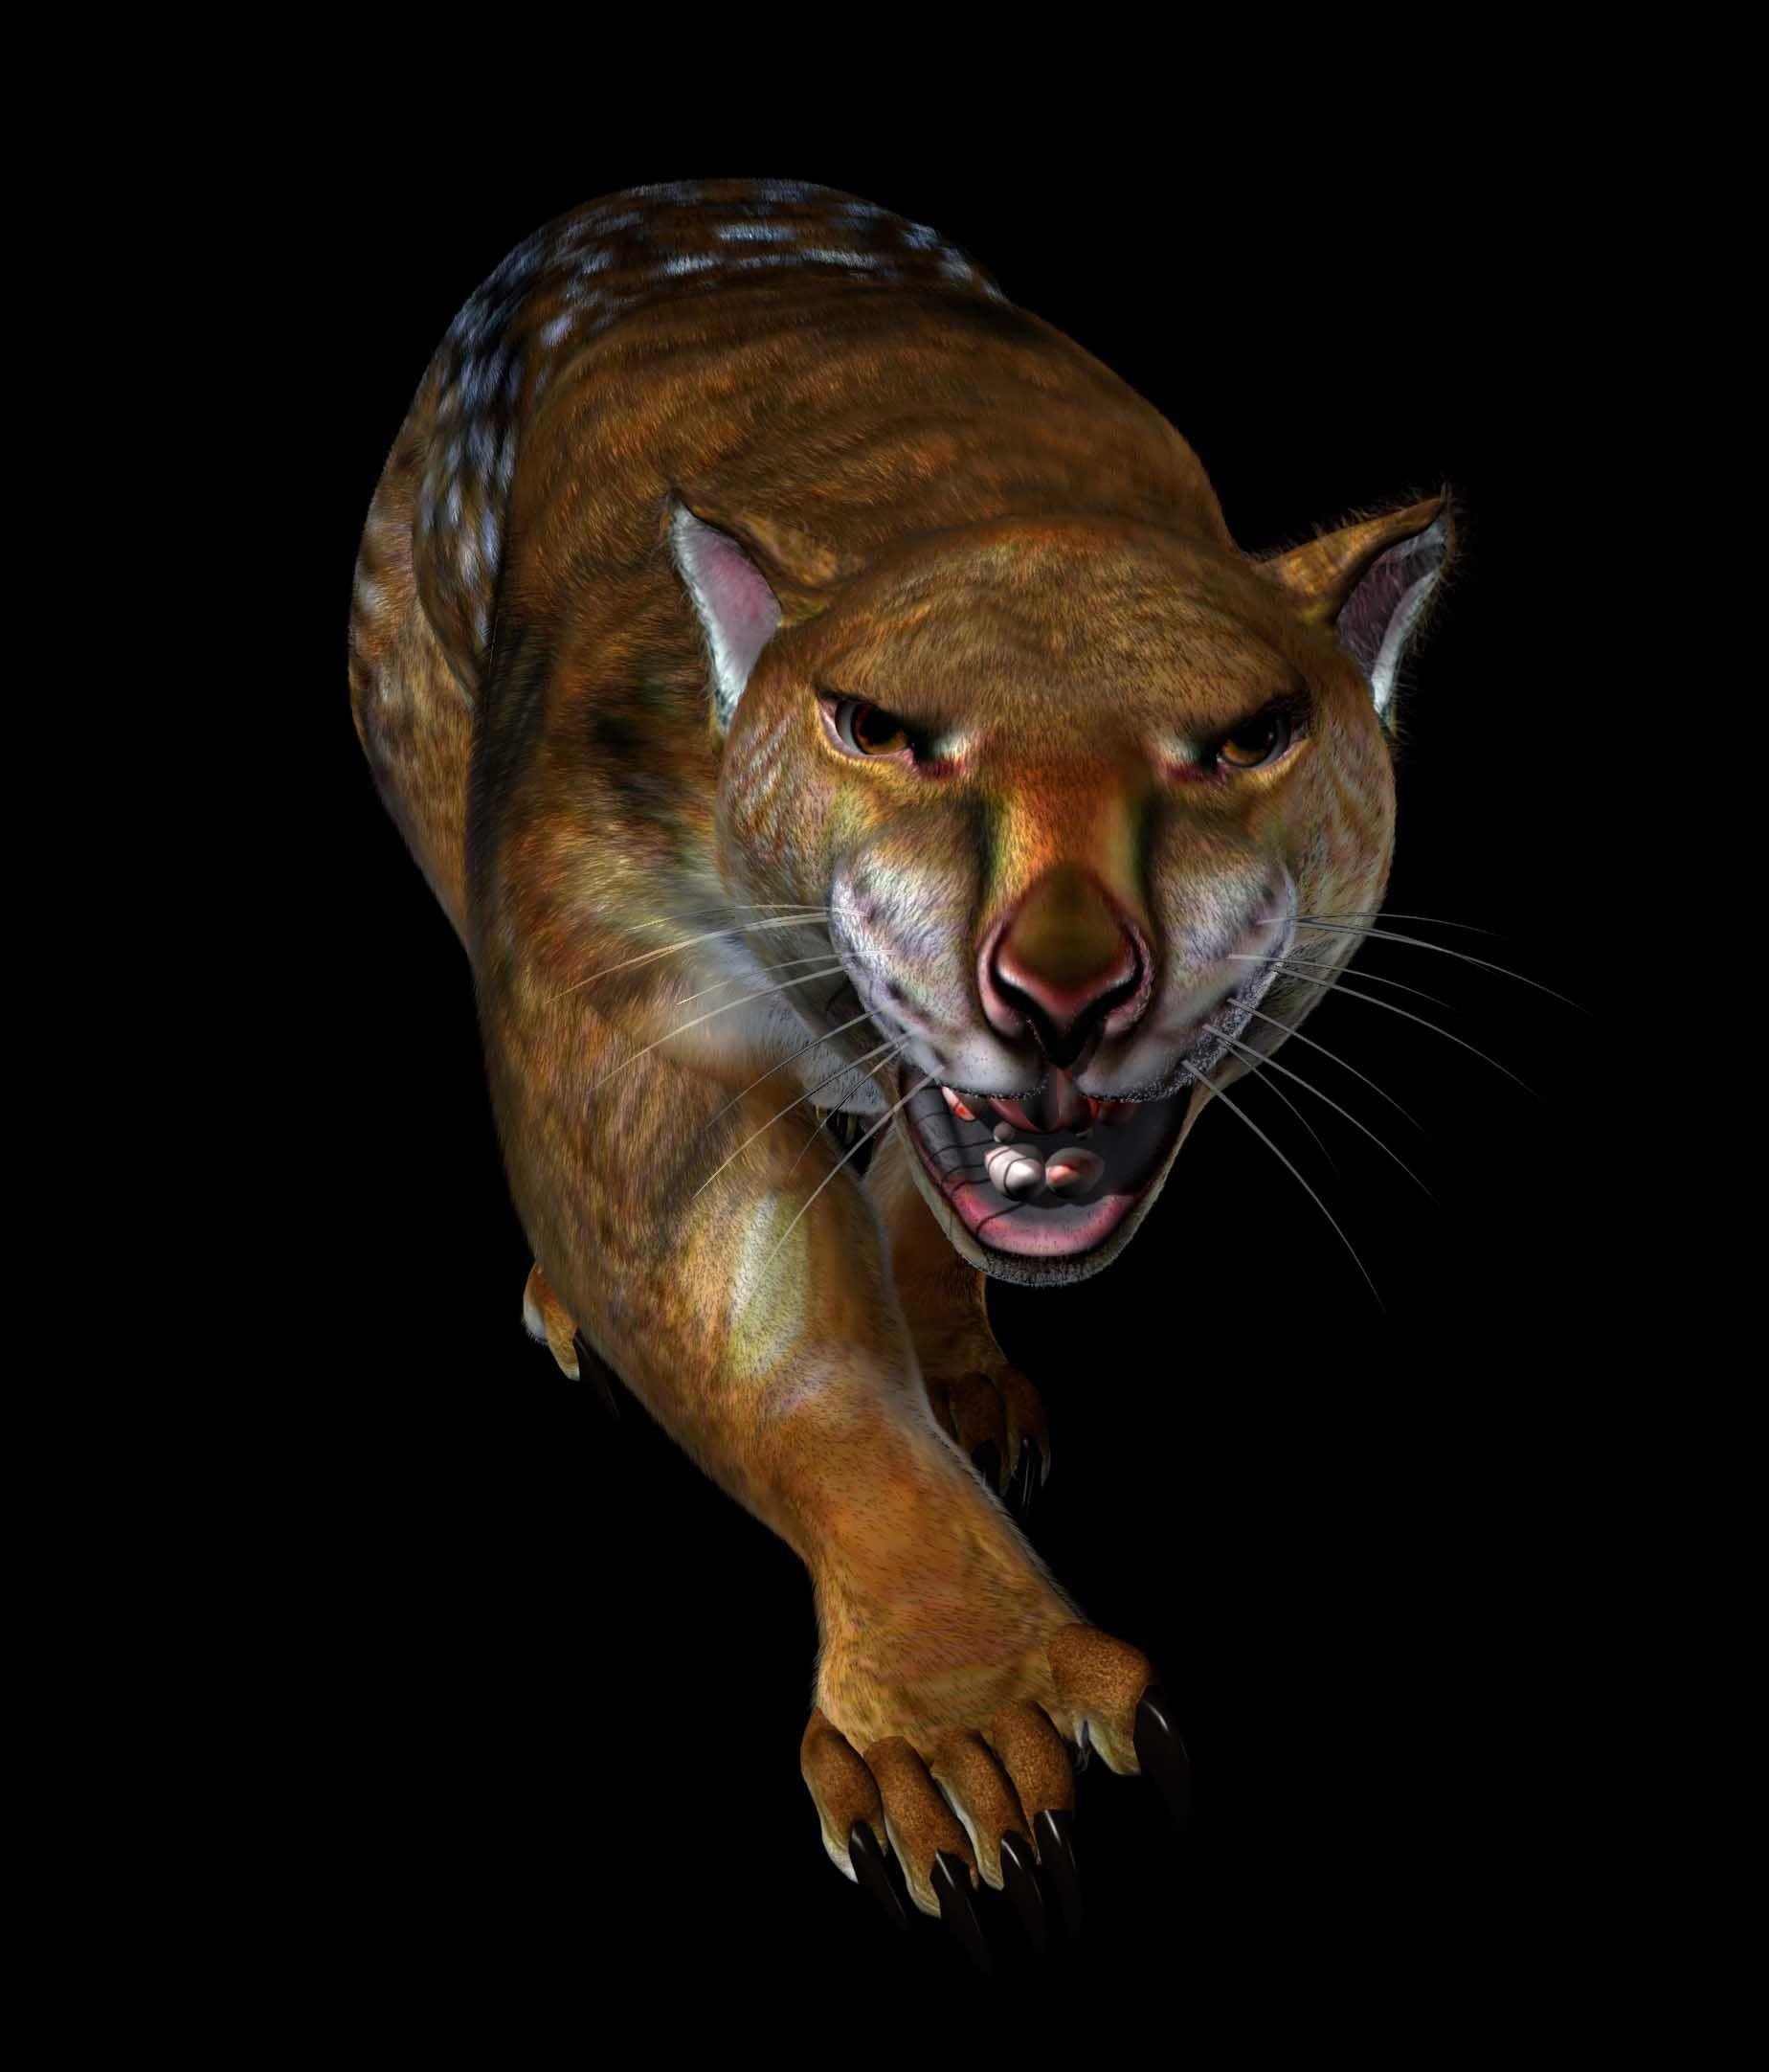 Lost Predator Thylacoleo The Marsupial Lion